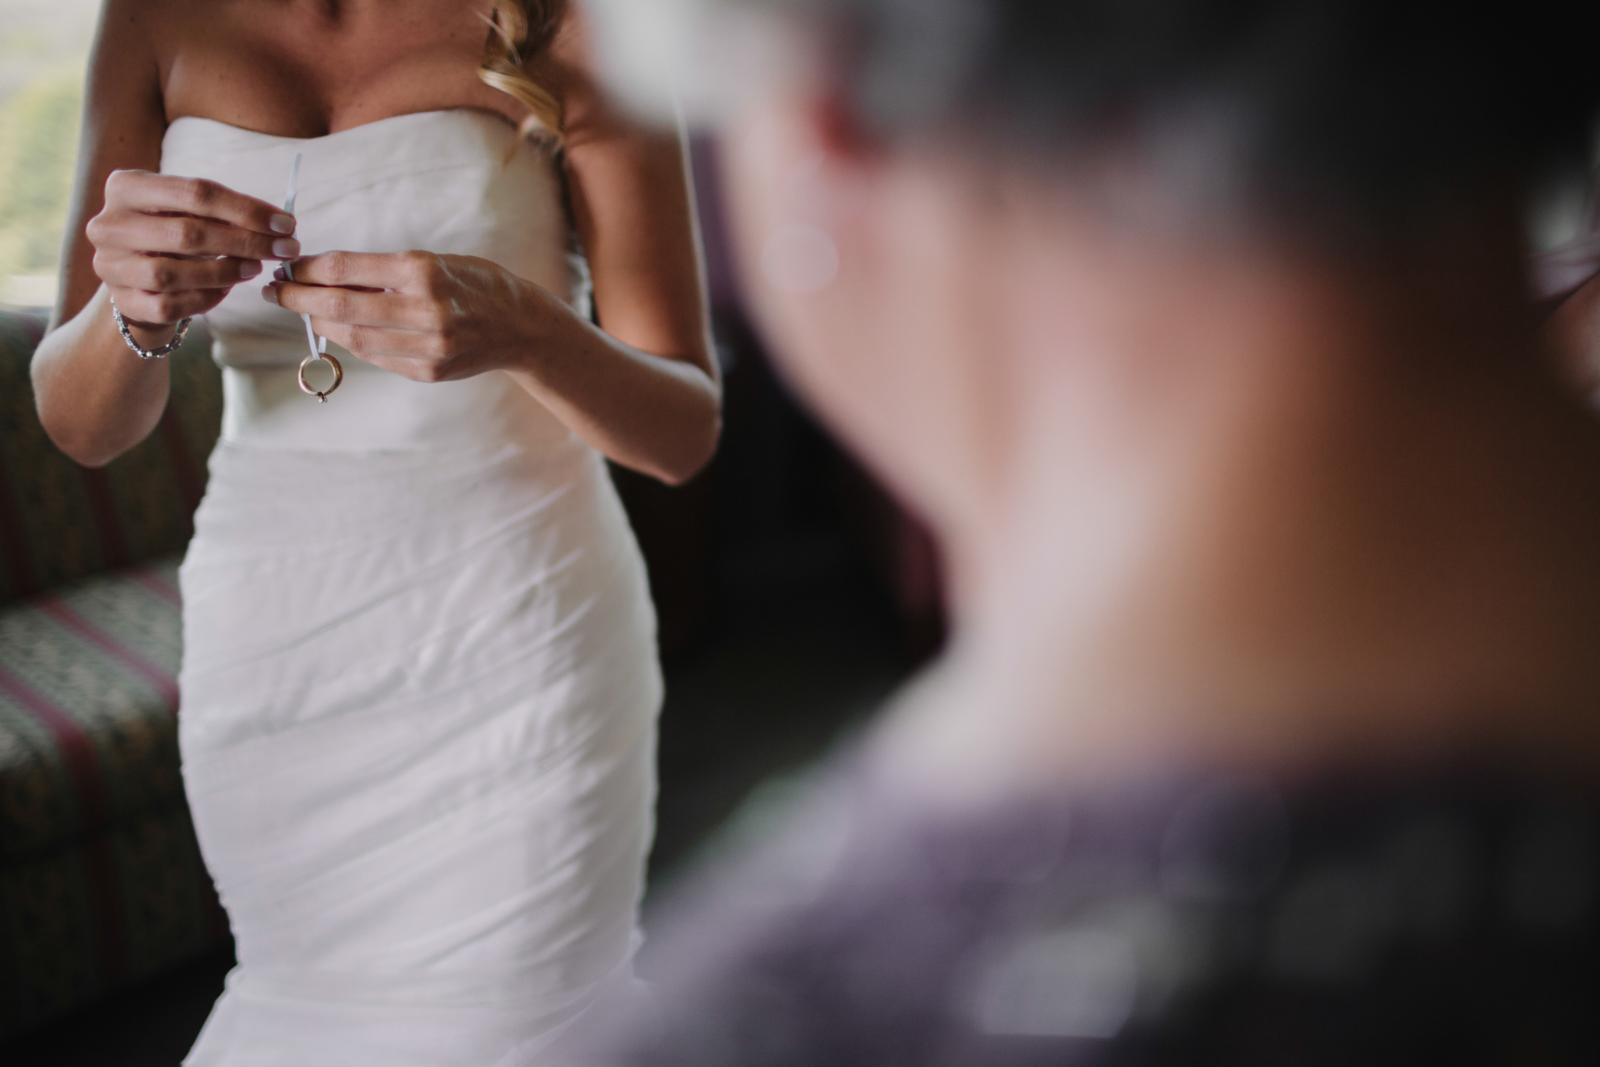 Northern Michigan Grand Traverse Resort Black Tie Wedding Photographer - Codee and Aaron-010.jpg